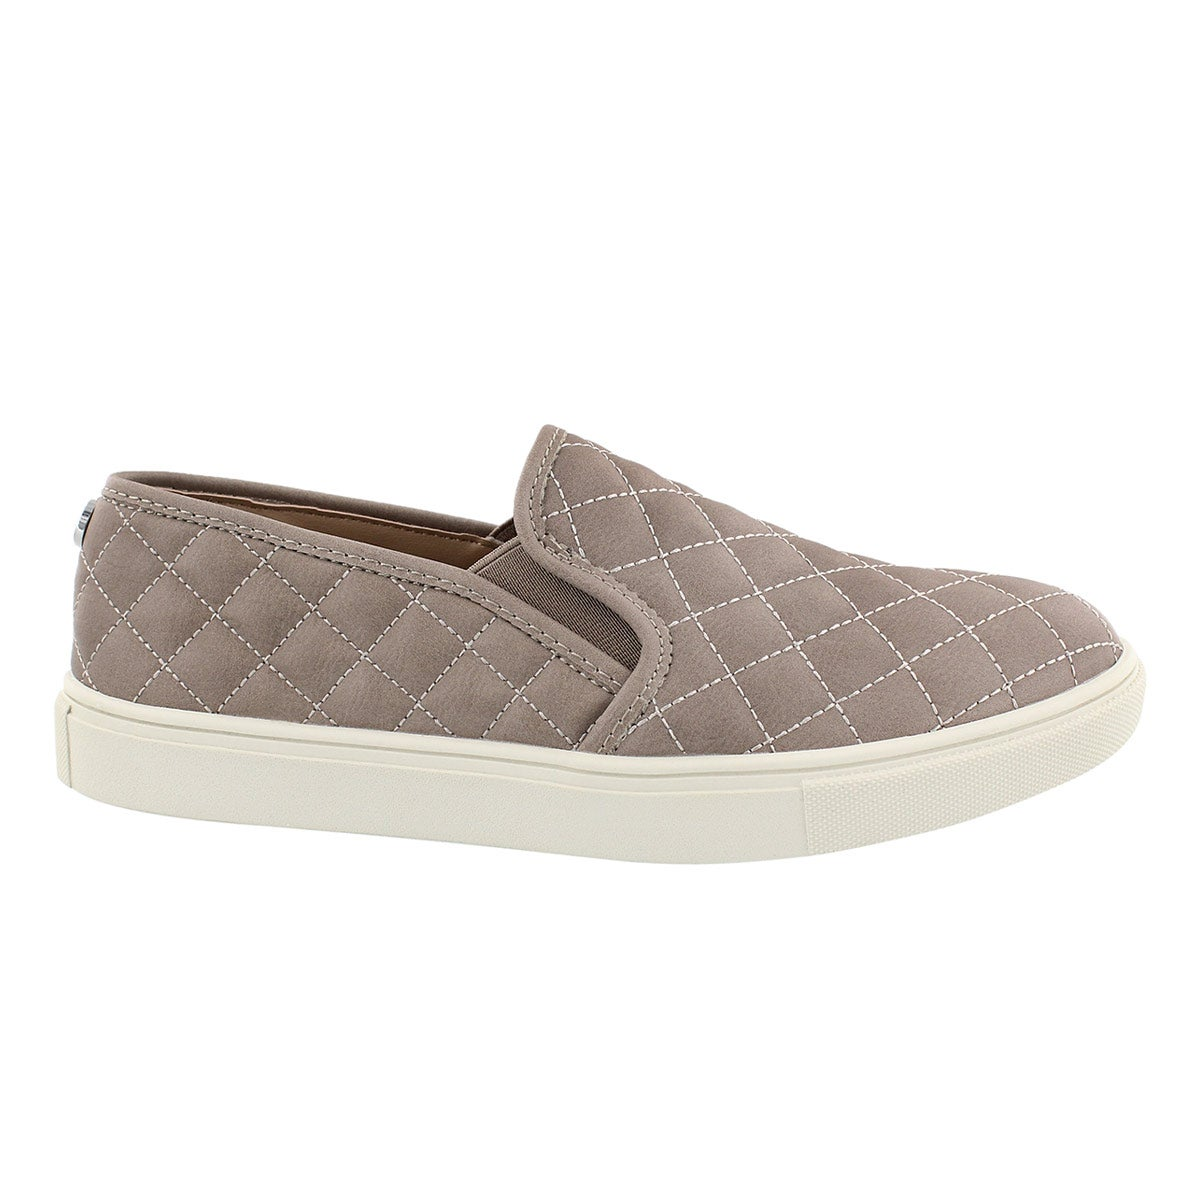 Lds Ecentrcq grey casual slip on shoe